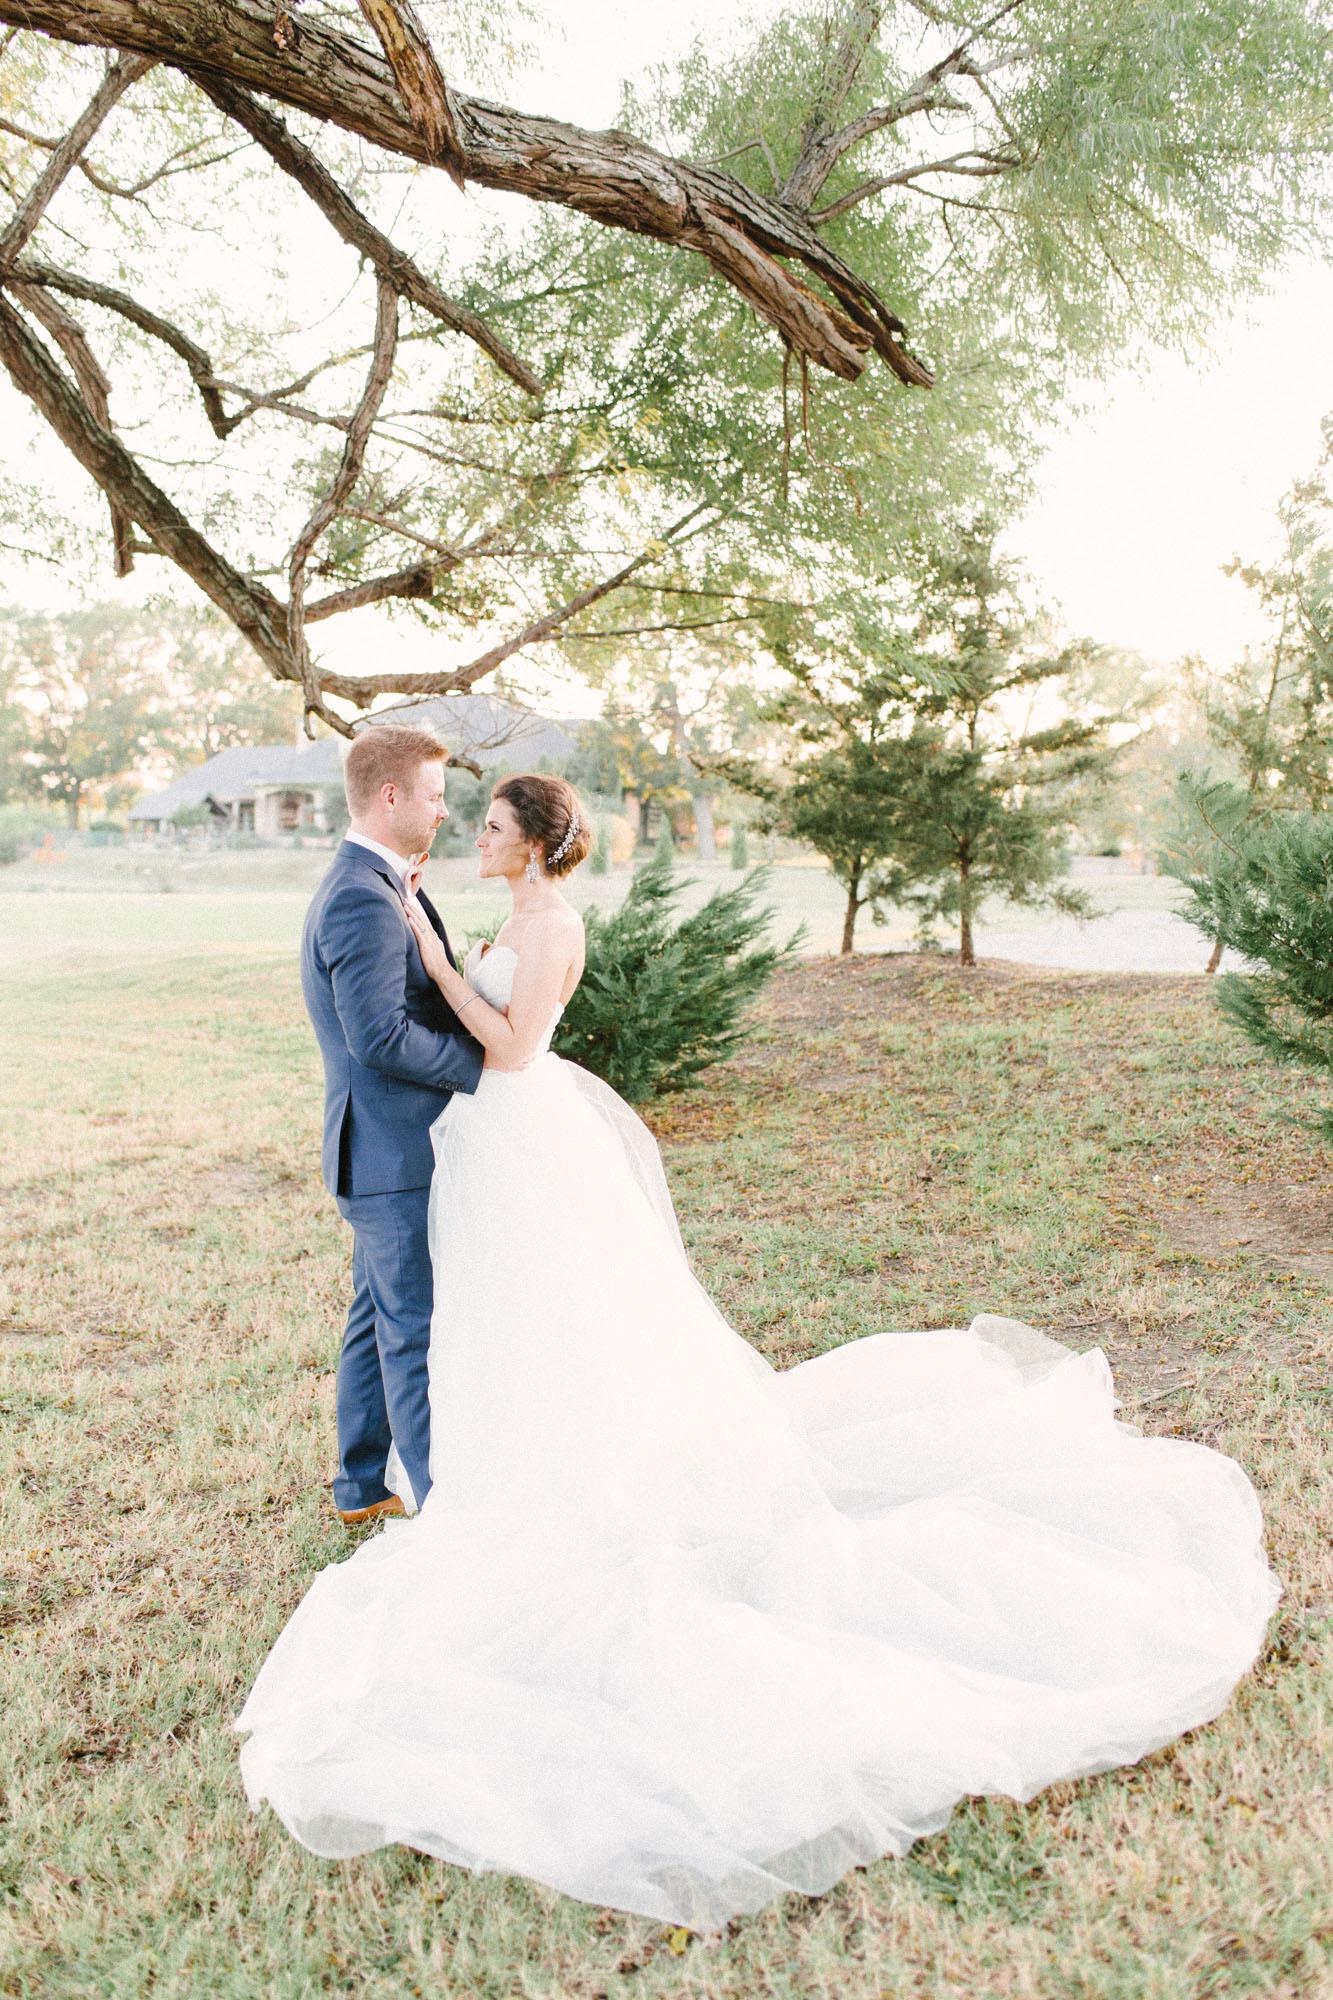 SM anna smith photography wedding photographer venue wedding planner-751.jpg